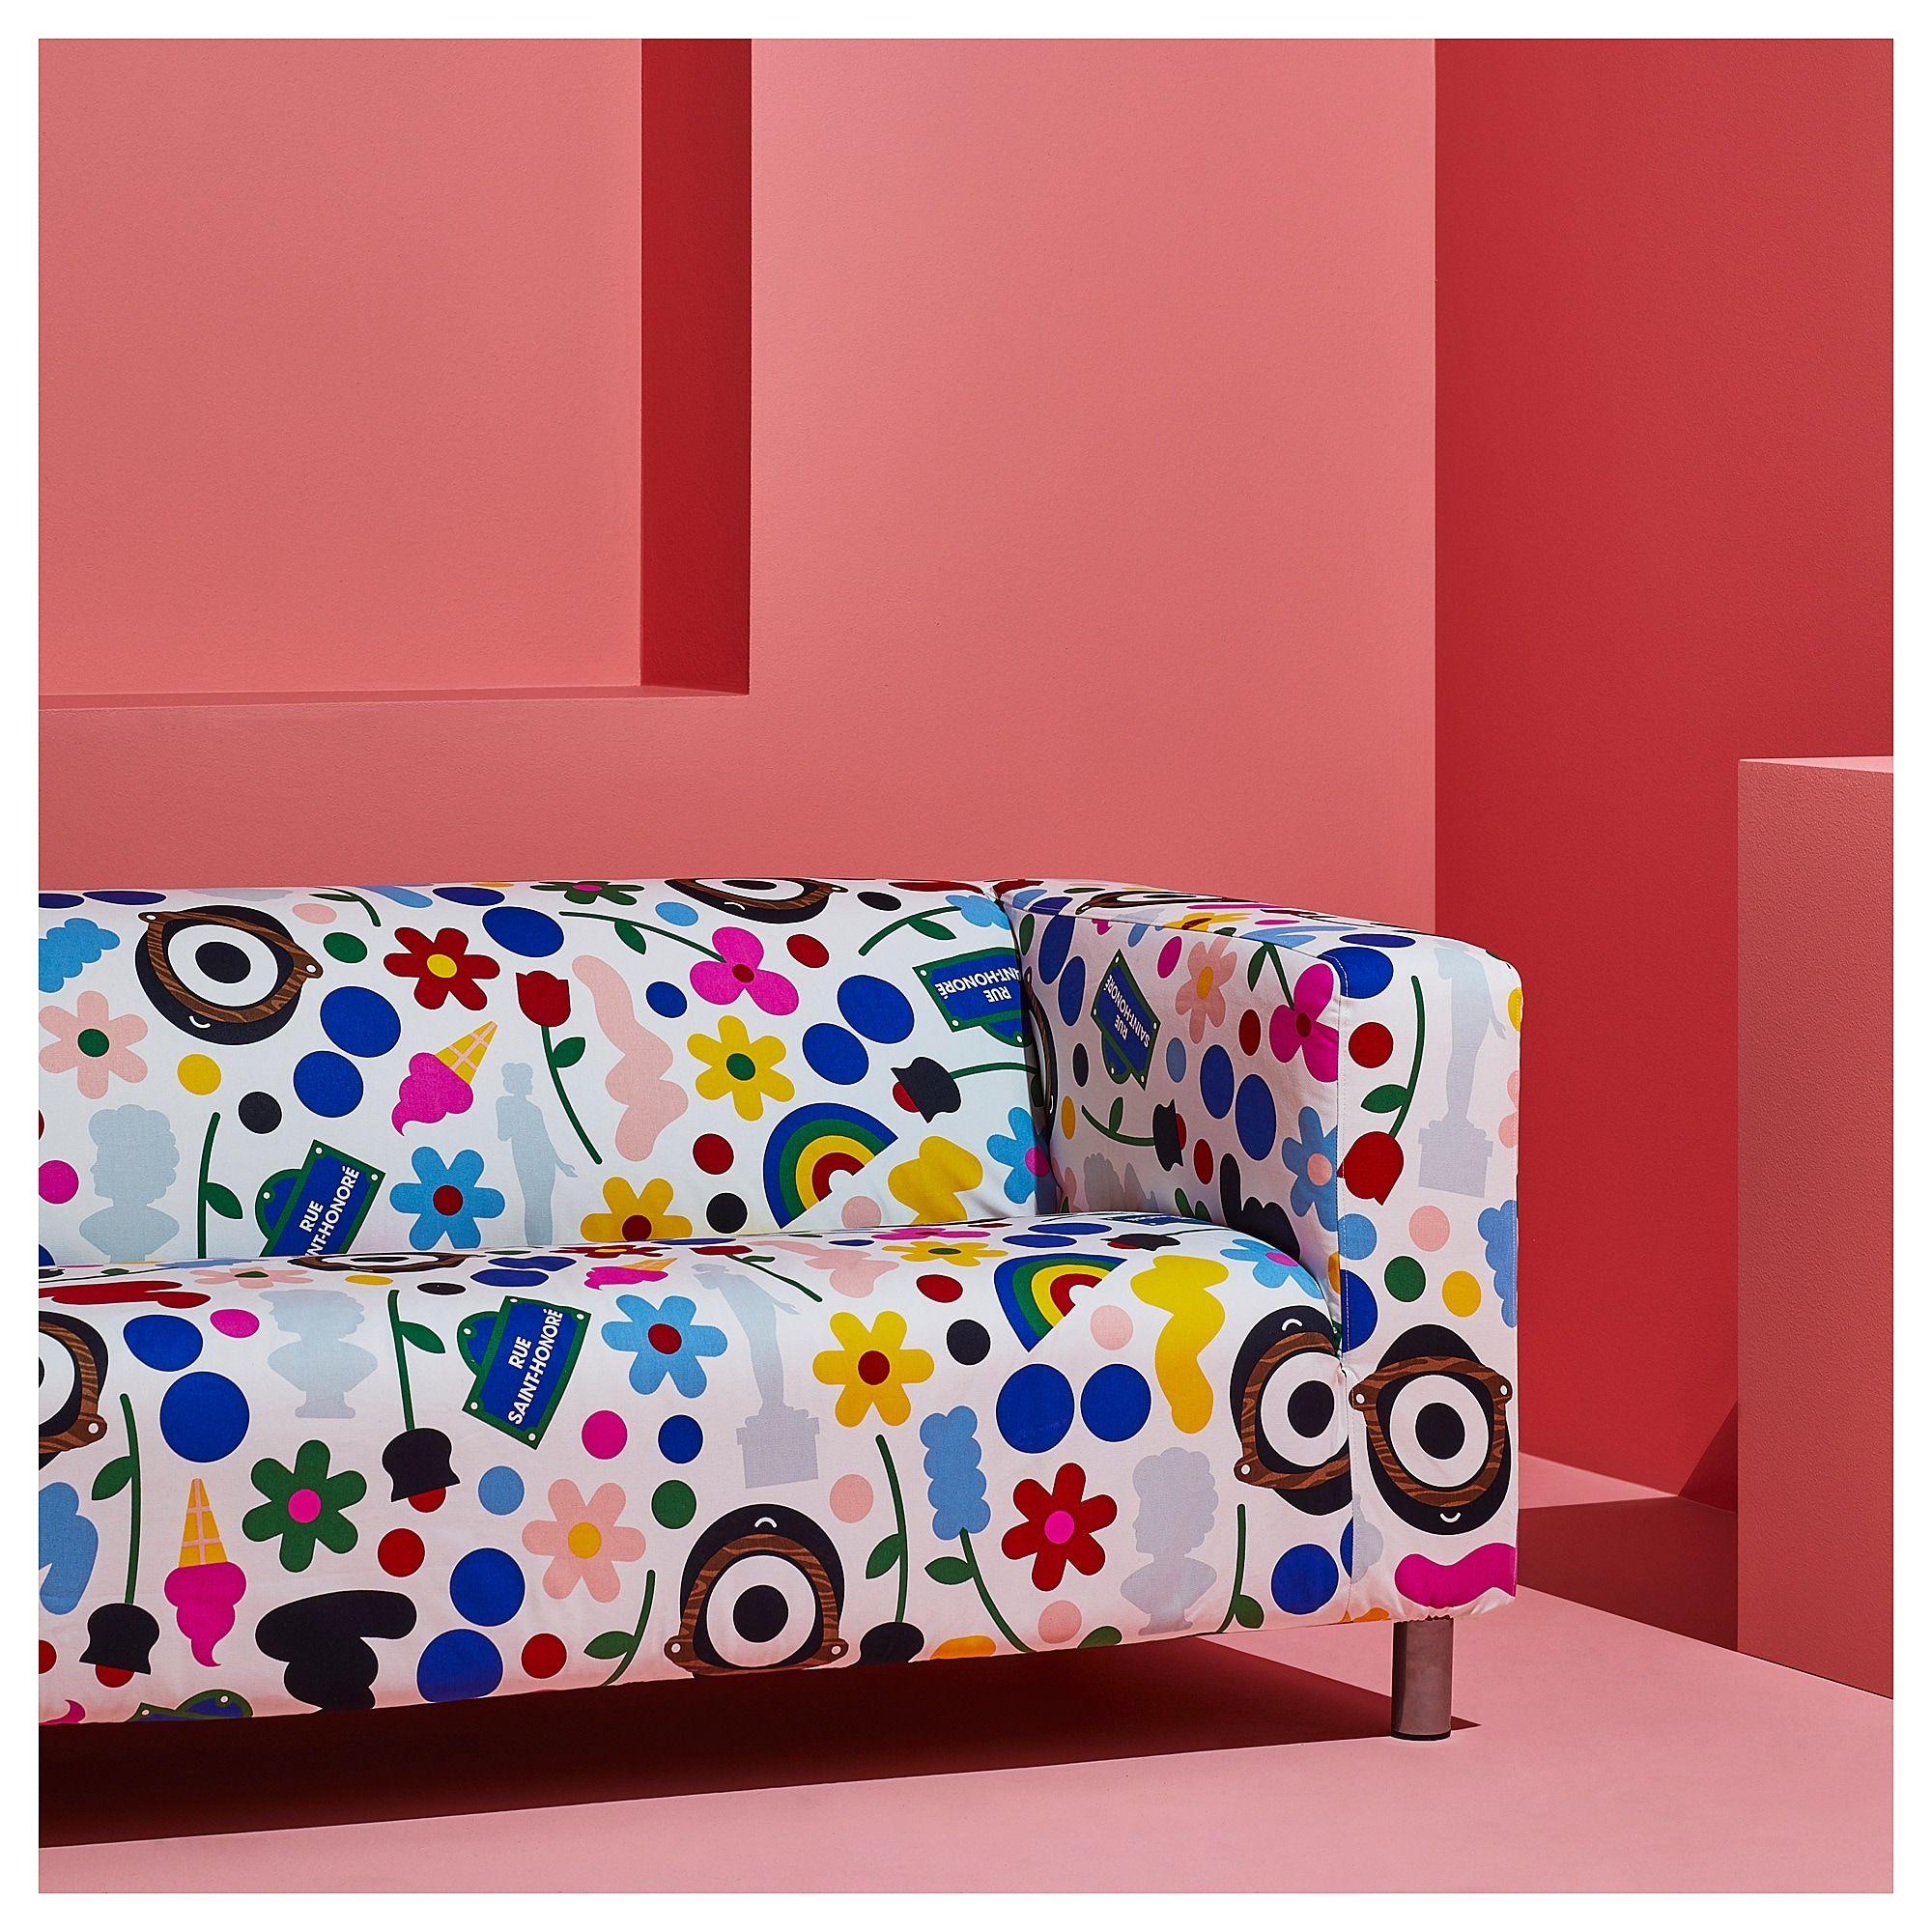 Full Size of Big Sofa Waschbarer Bezug Mit Abnehmbaren Ikea Modulares Abnehmbarem Sofas Abnehmbarer Hussen Grau Abnehmbar Waschbar Klippan 2er Frnyad Bunt Weiß Xxxl Xxl Sofa Sofa Abnehmbarer Bezug